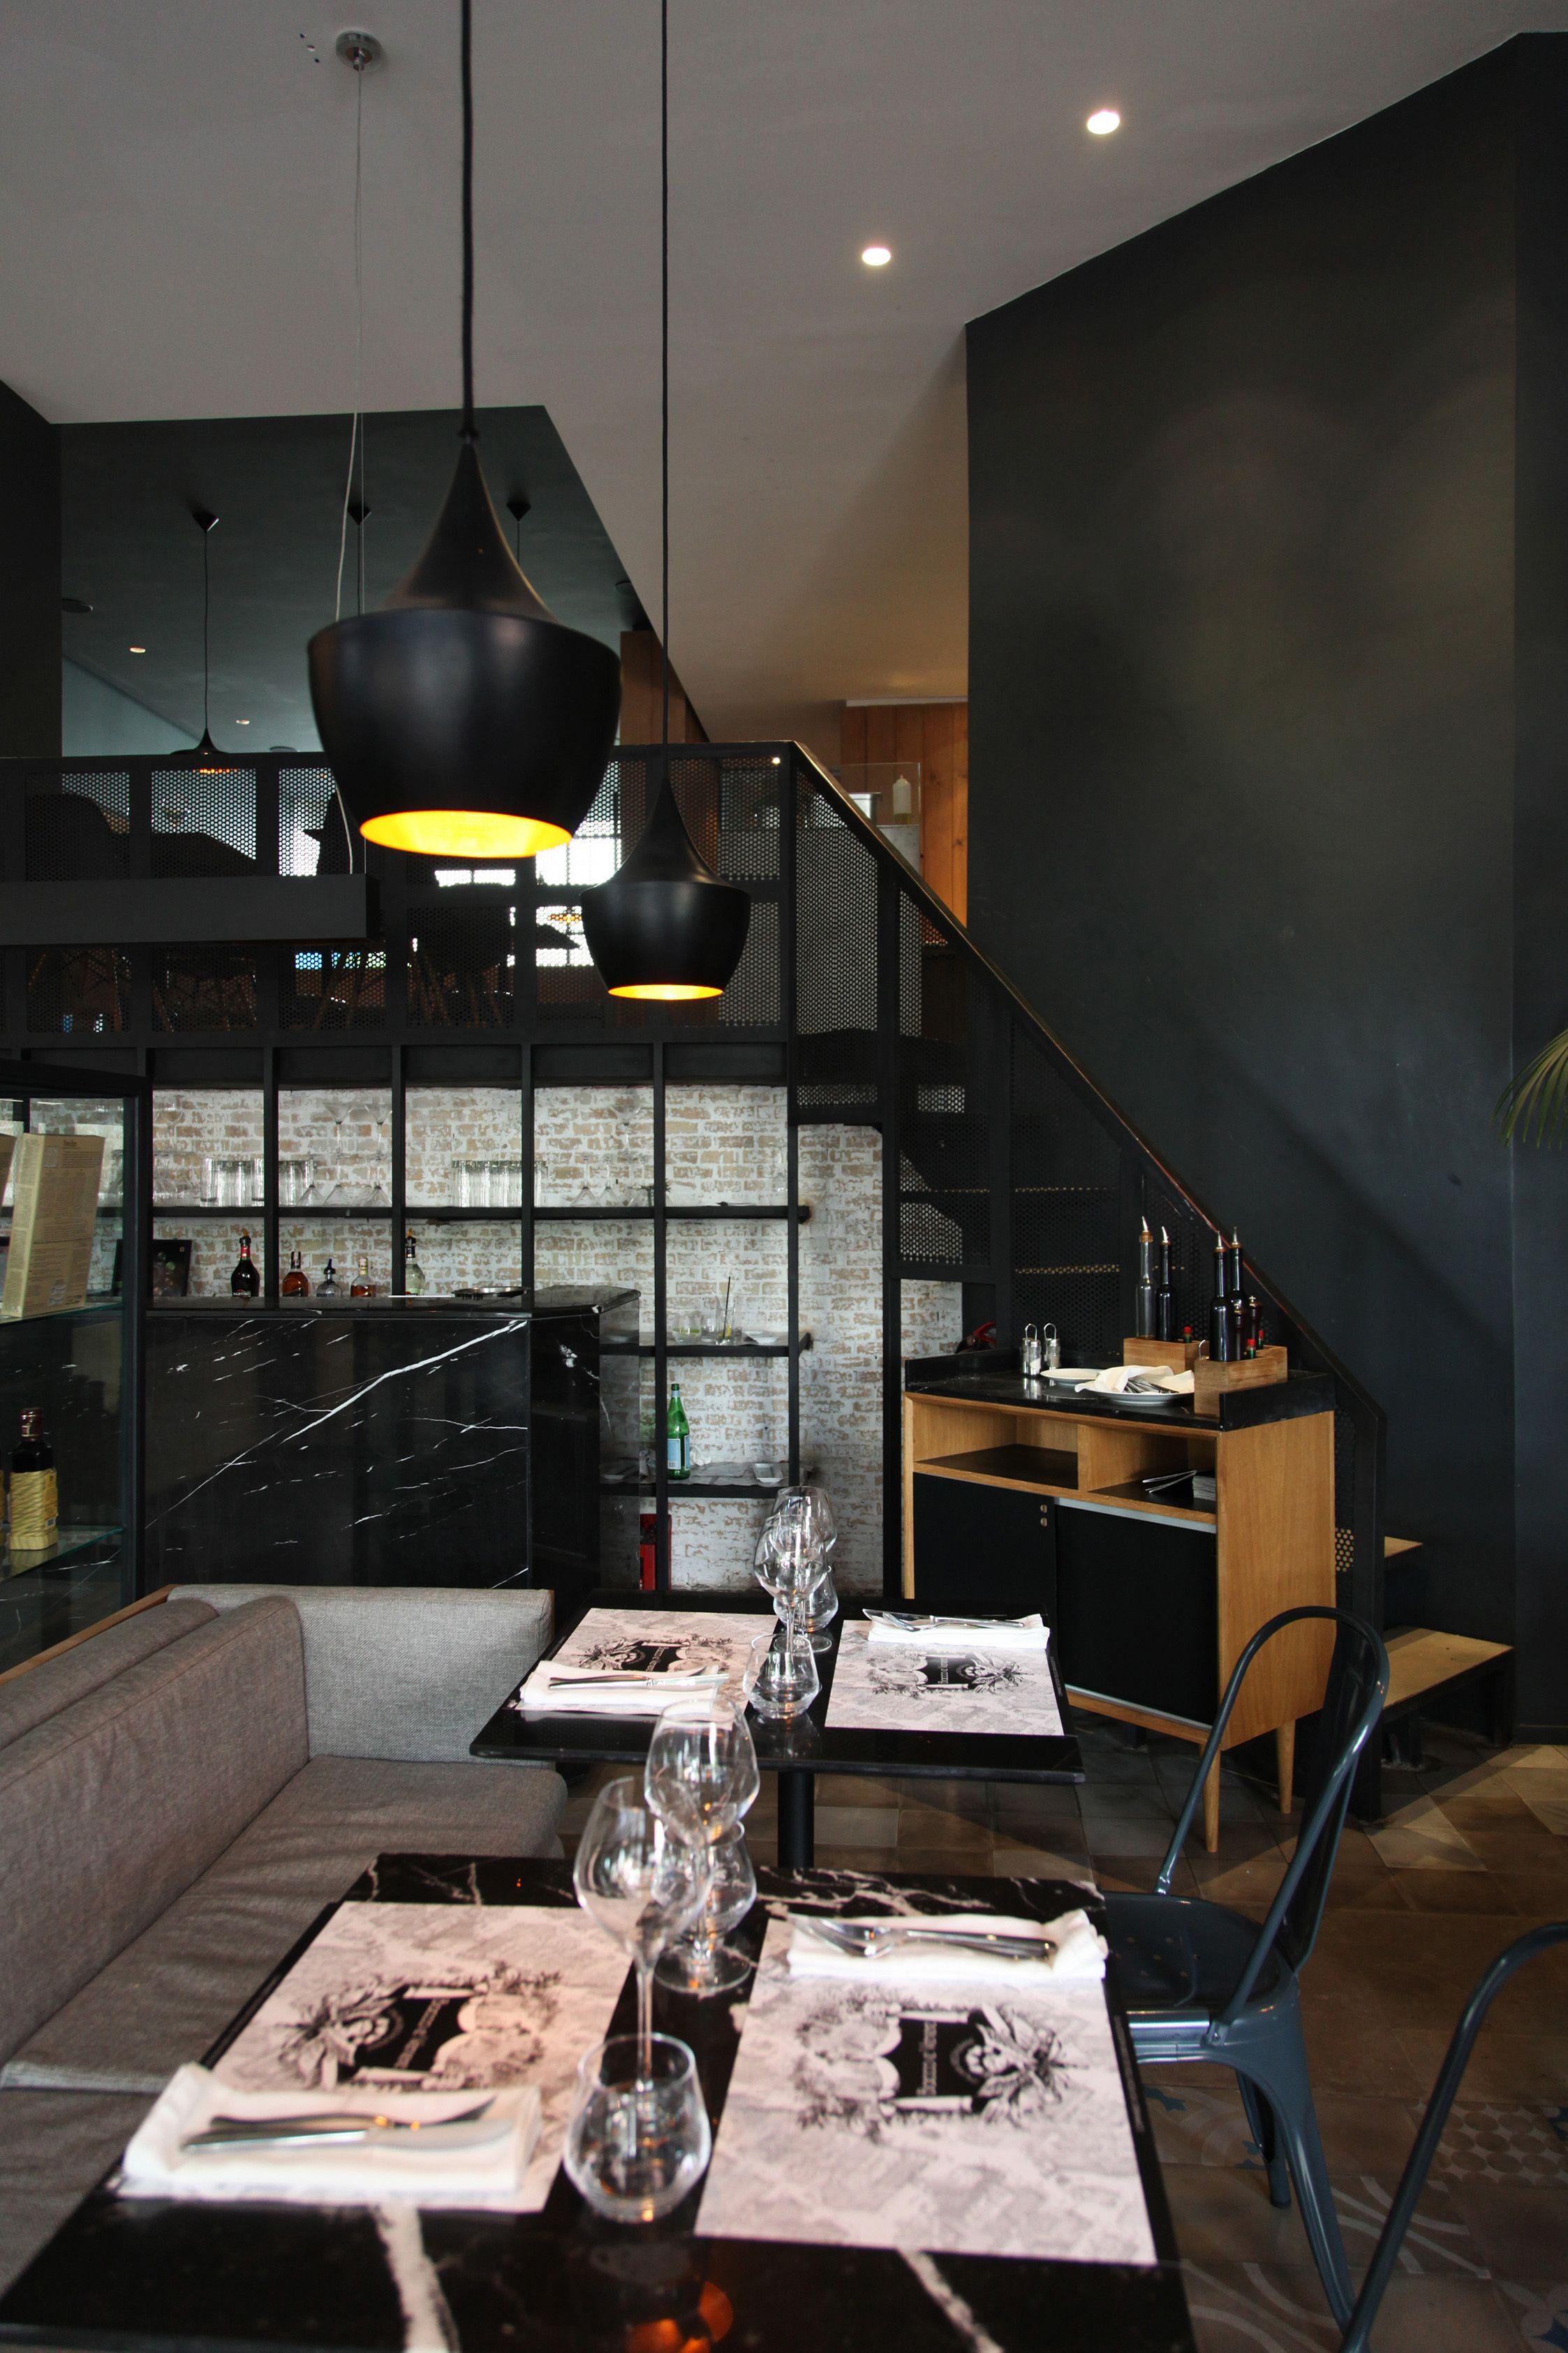 Restaurant Baccoevenere Casablanca Maroc Concept By Dumdum Design Restaurant Bacco E Venere Saveur